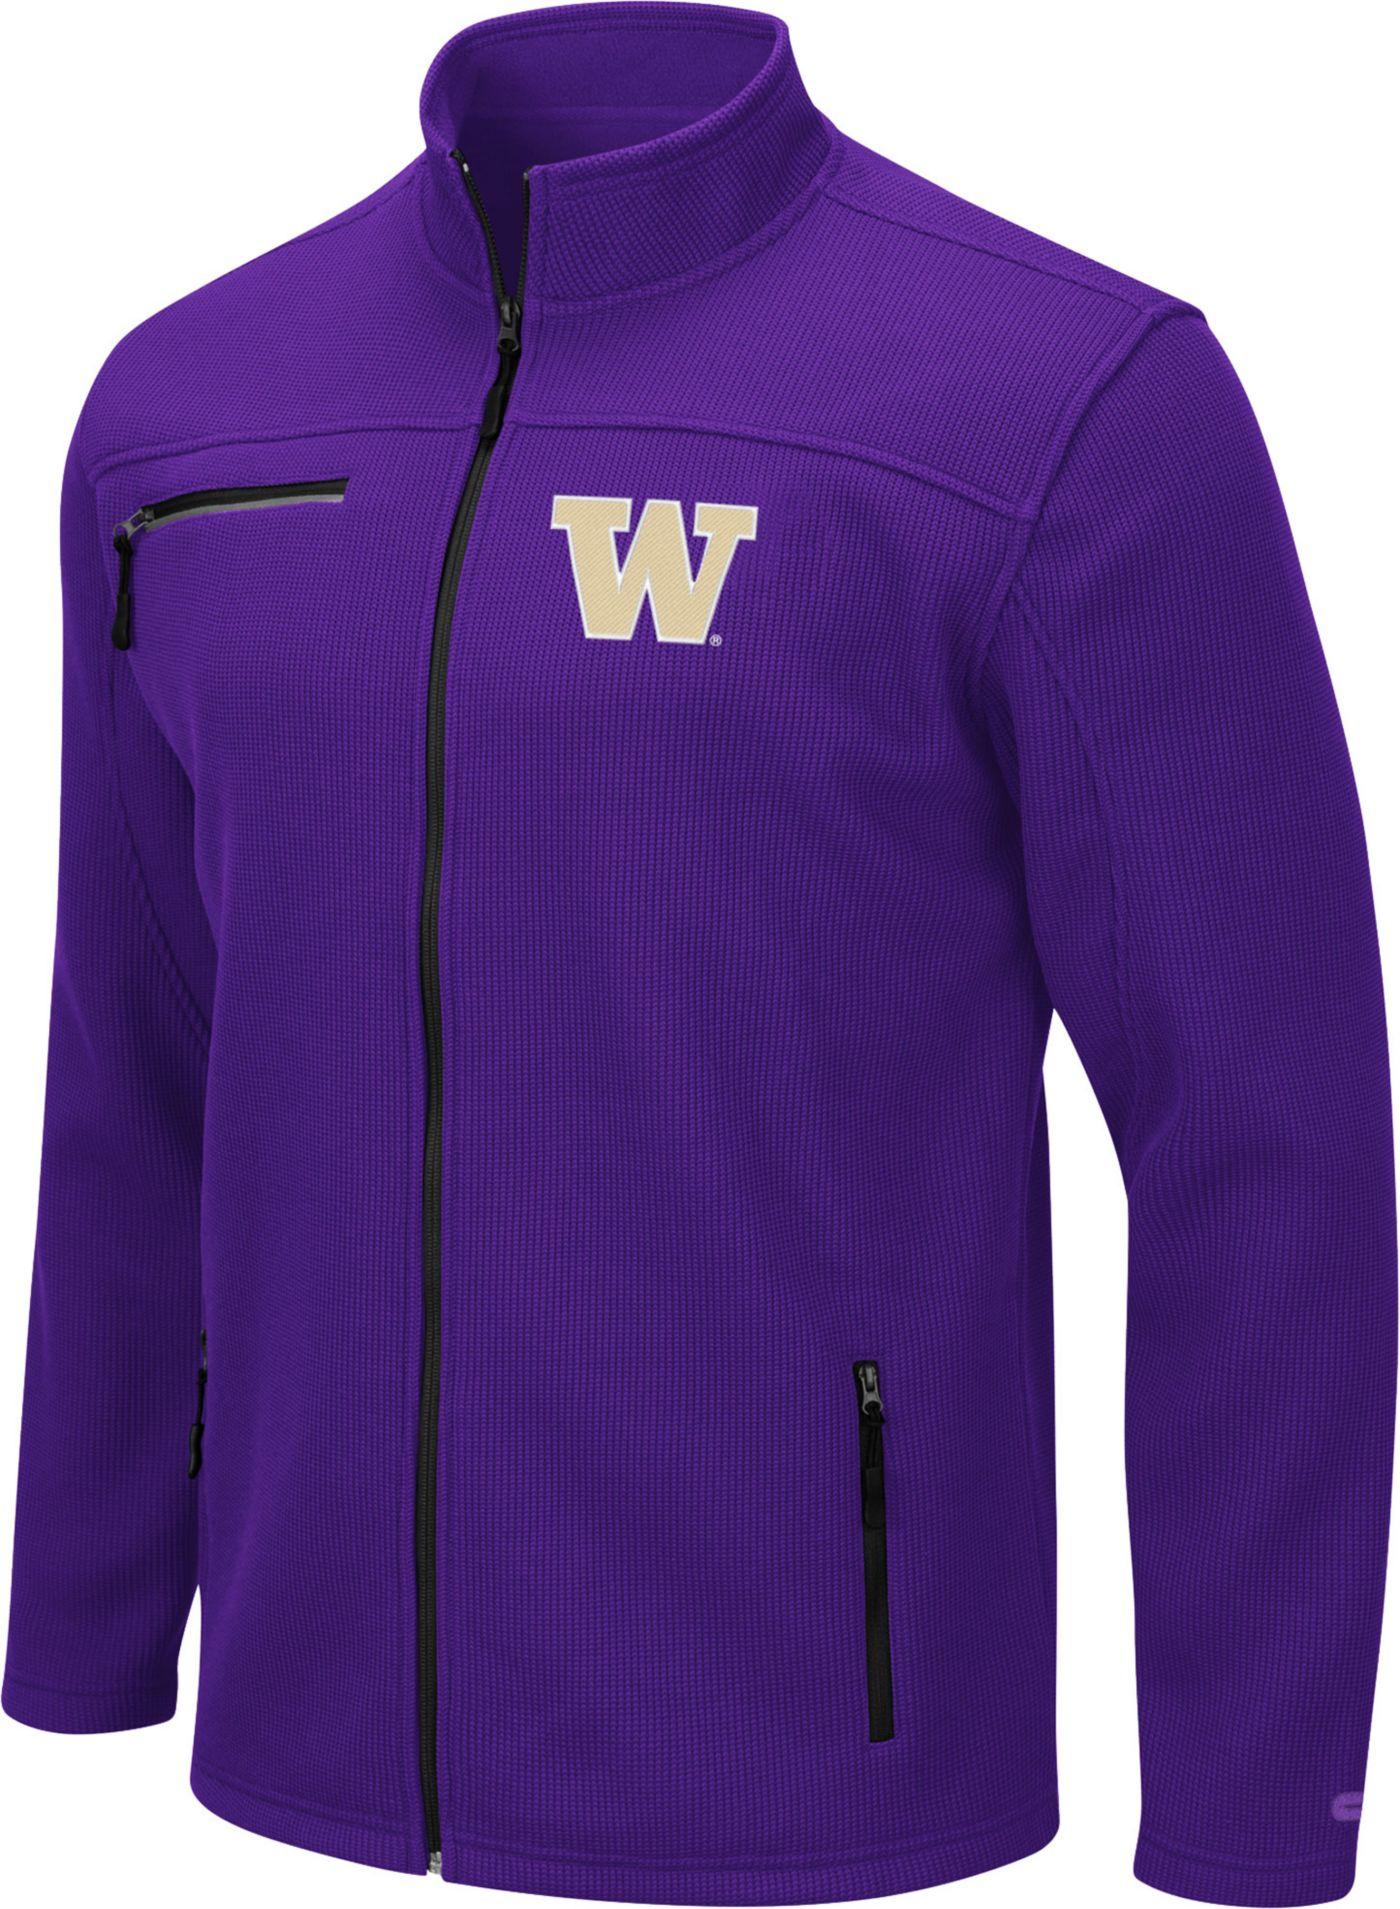 Colosseum Men's Washington Huskies Purple Willie Full-Zip Jacket